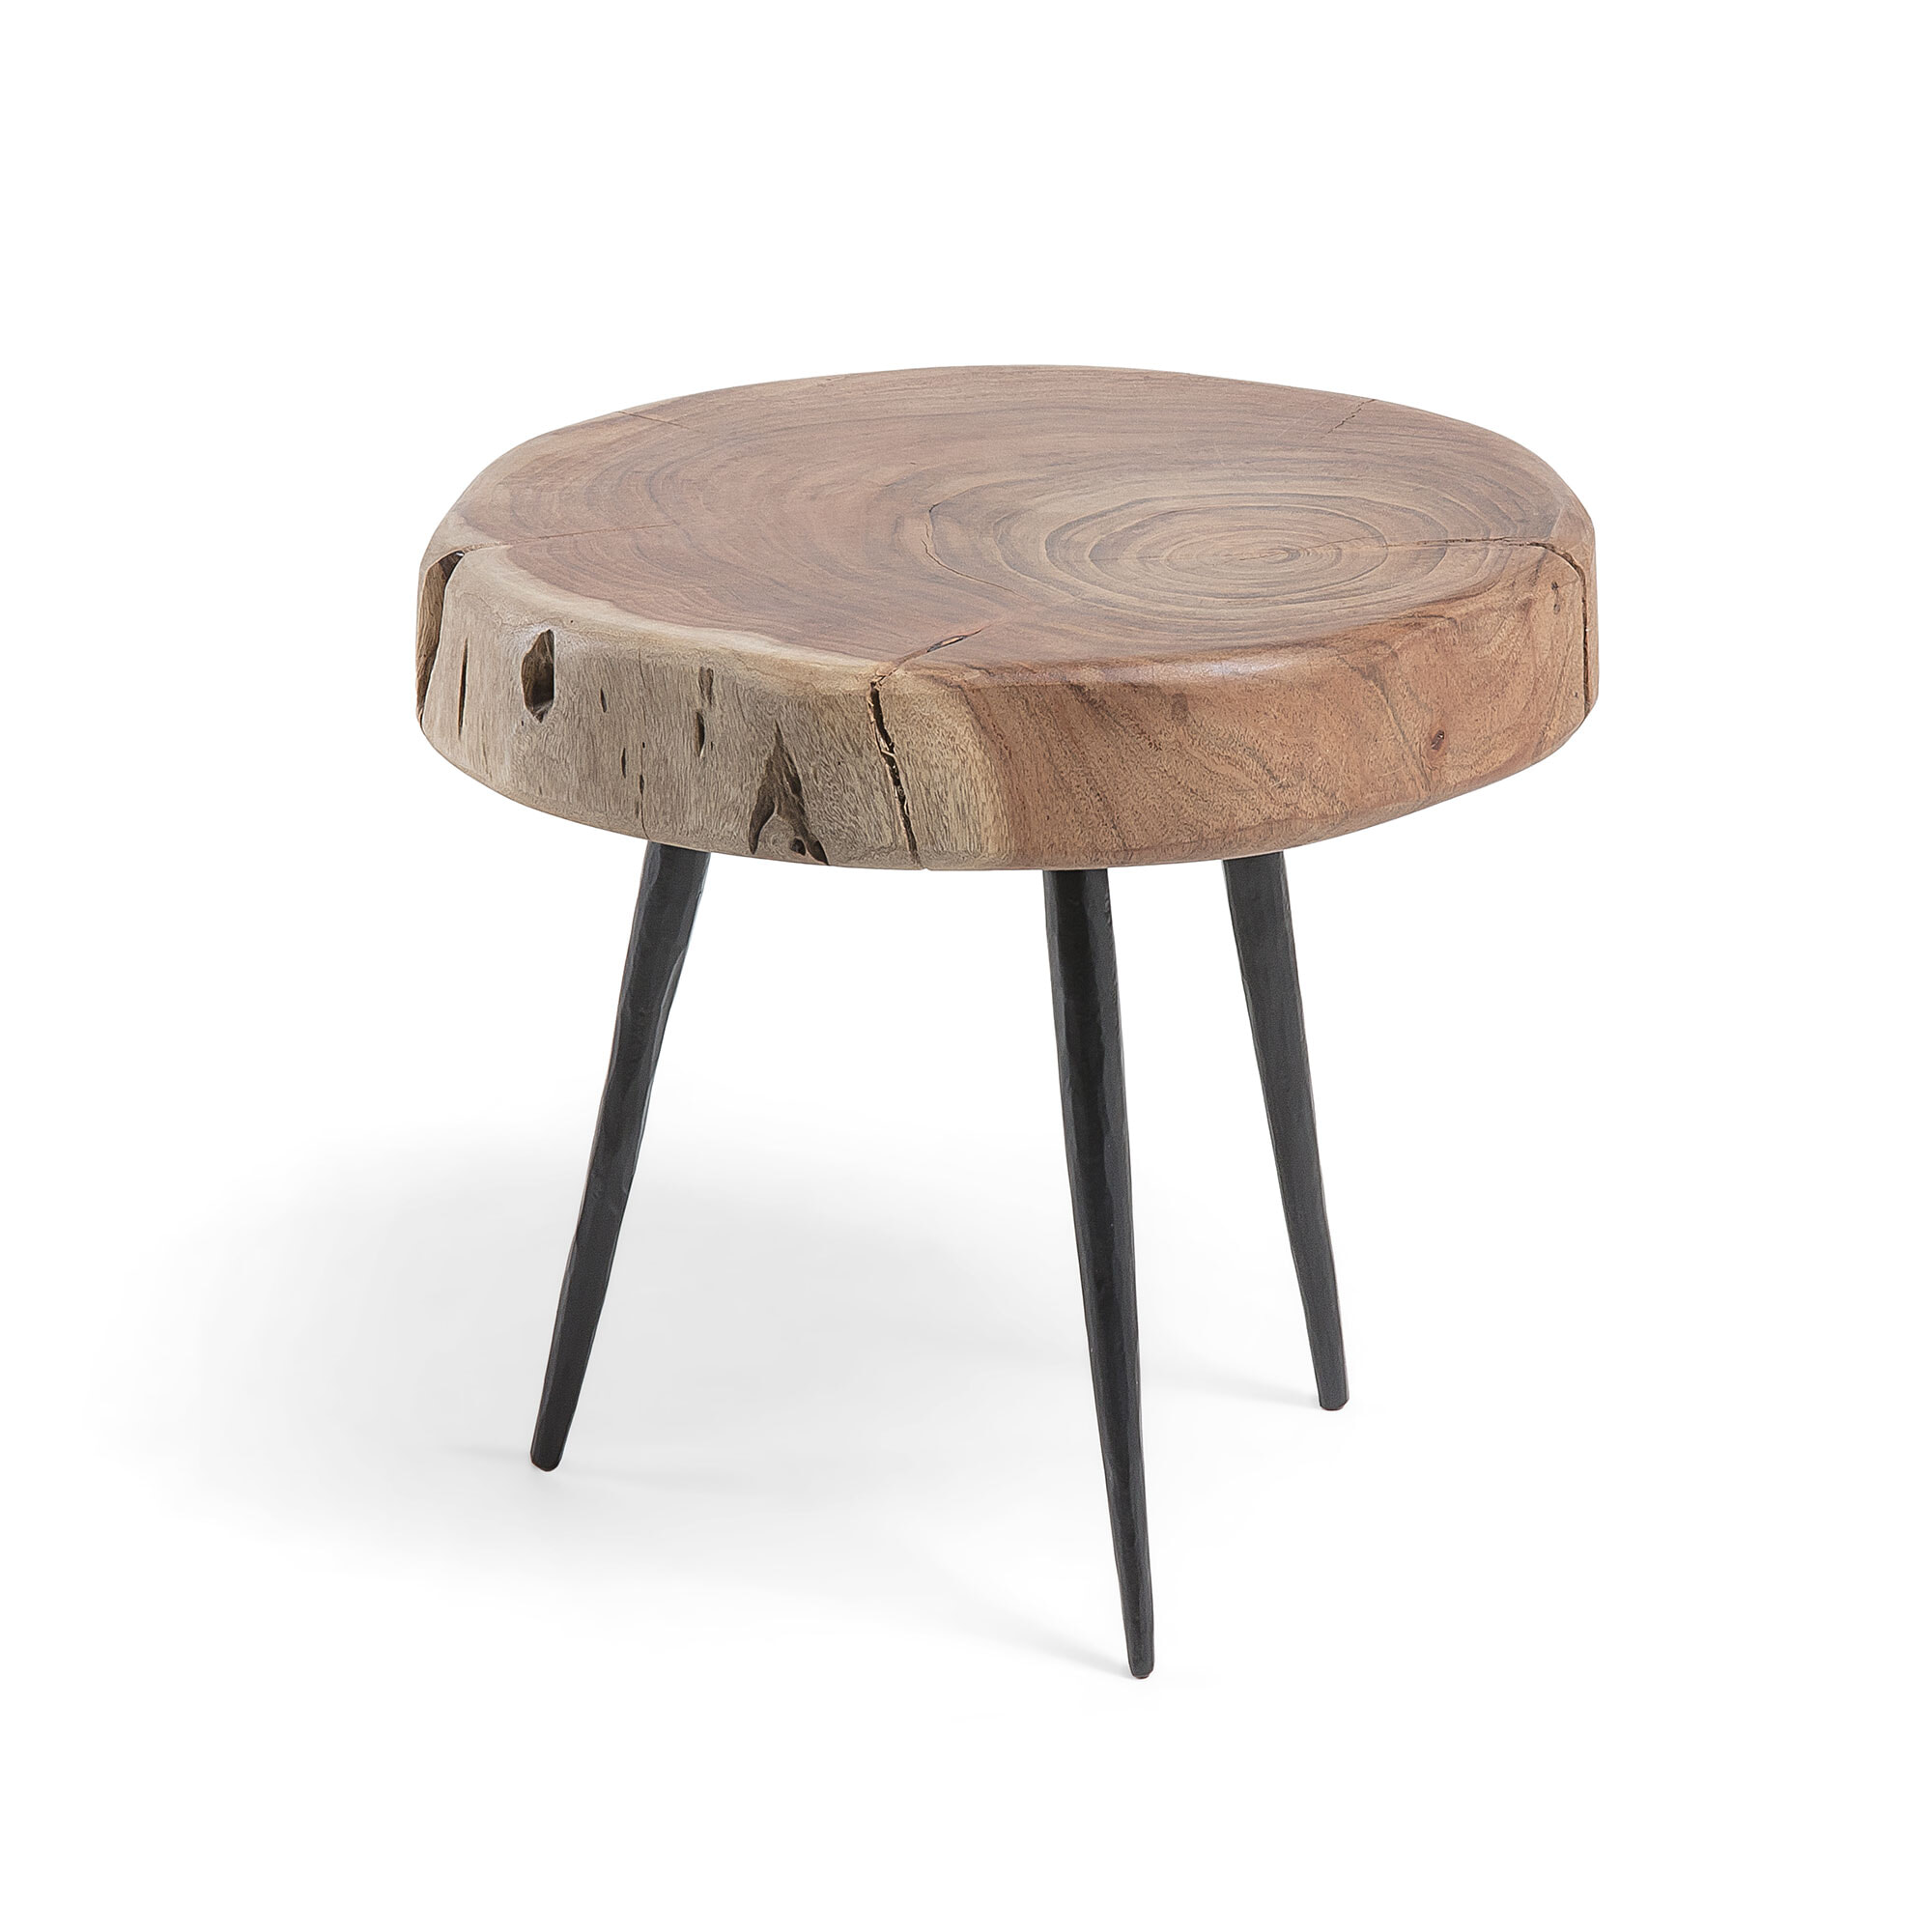 Uw partner in meubels: Kave Home Bijzettafel 'Eider' 30cm hoog Tafels | Bijzettafels